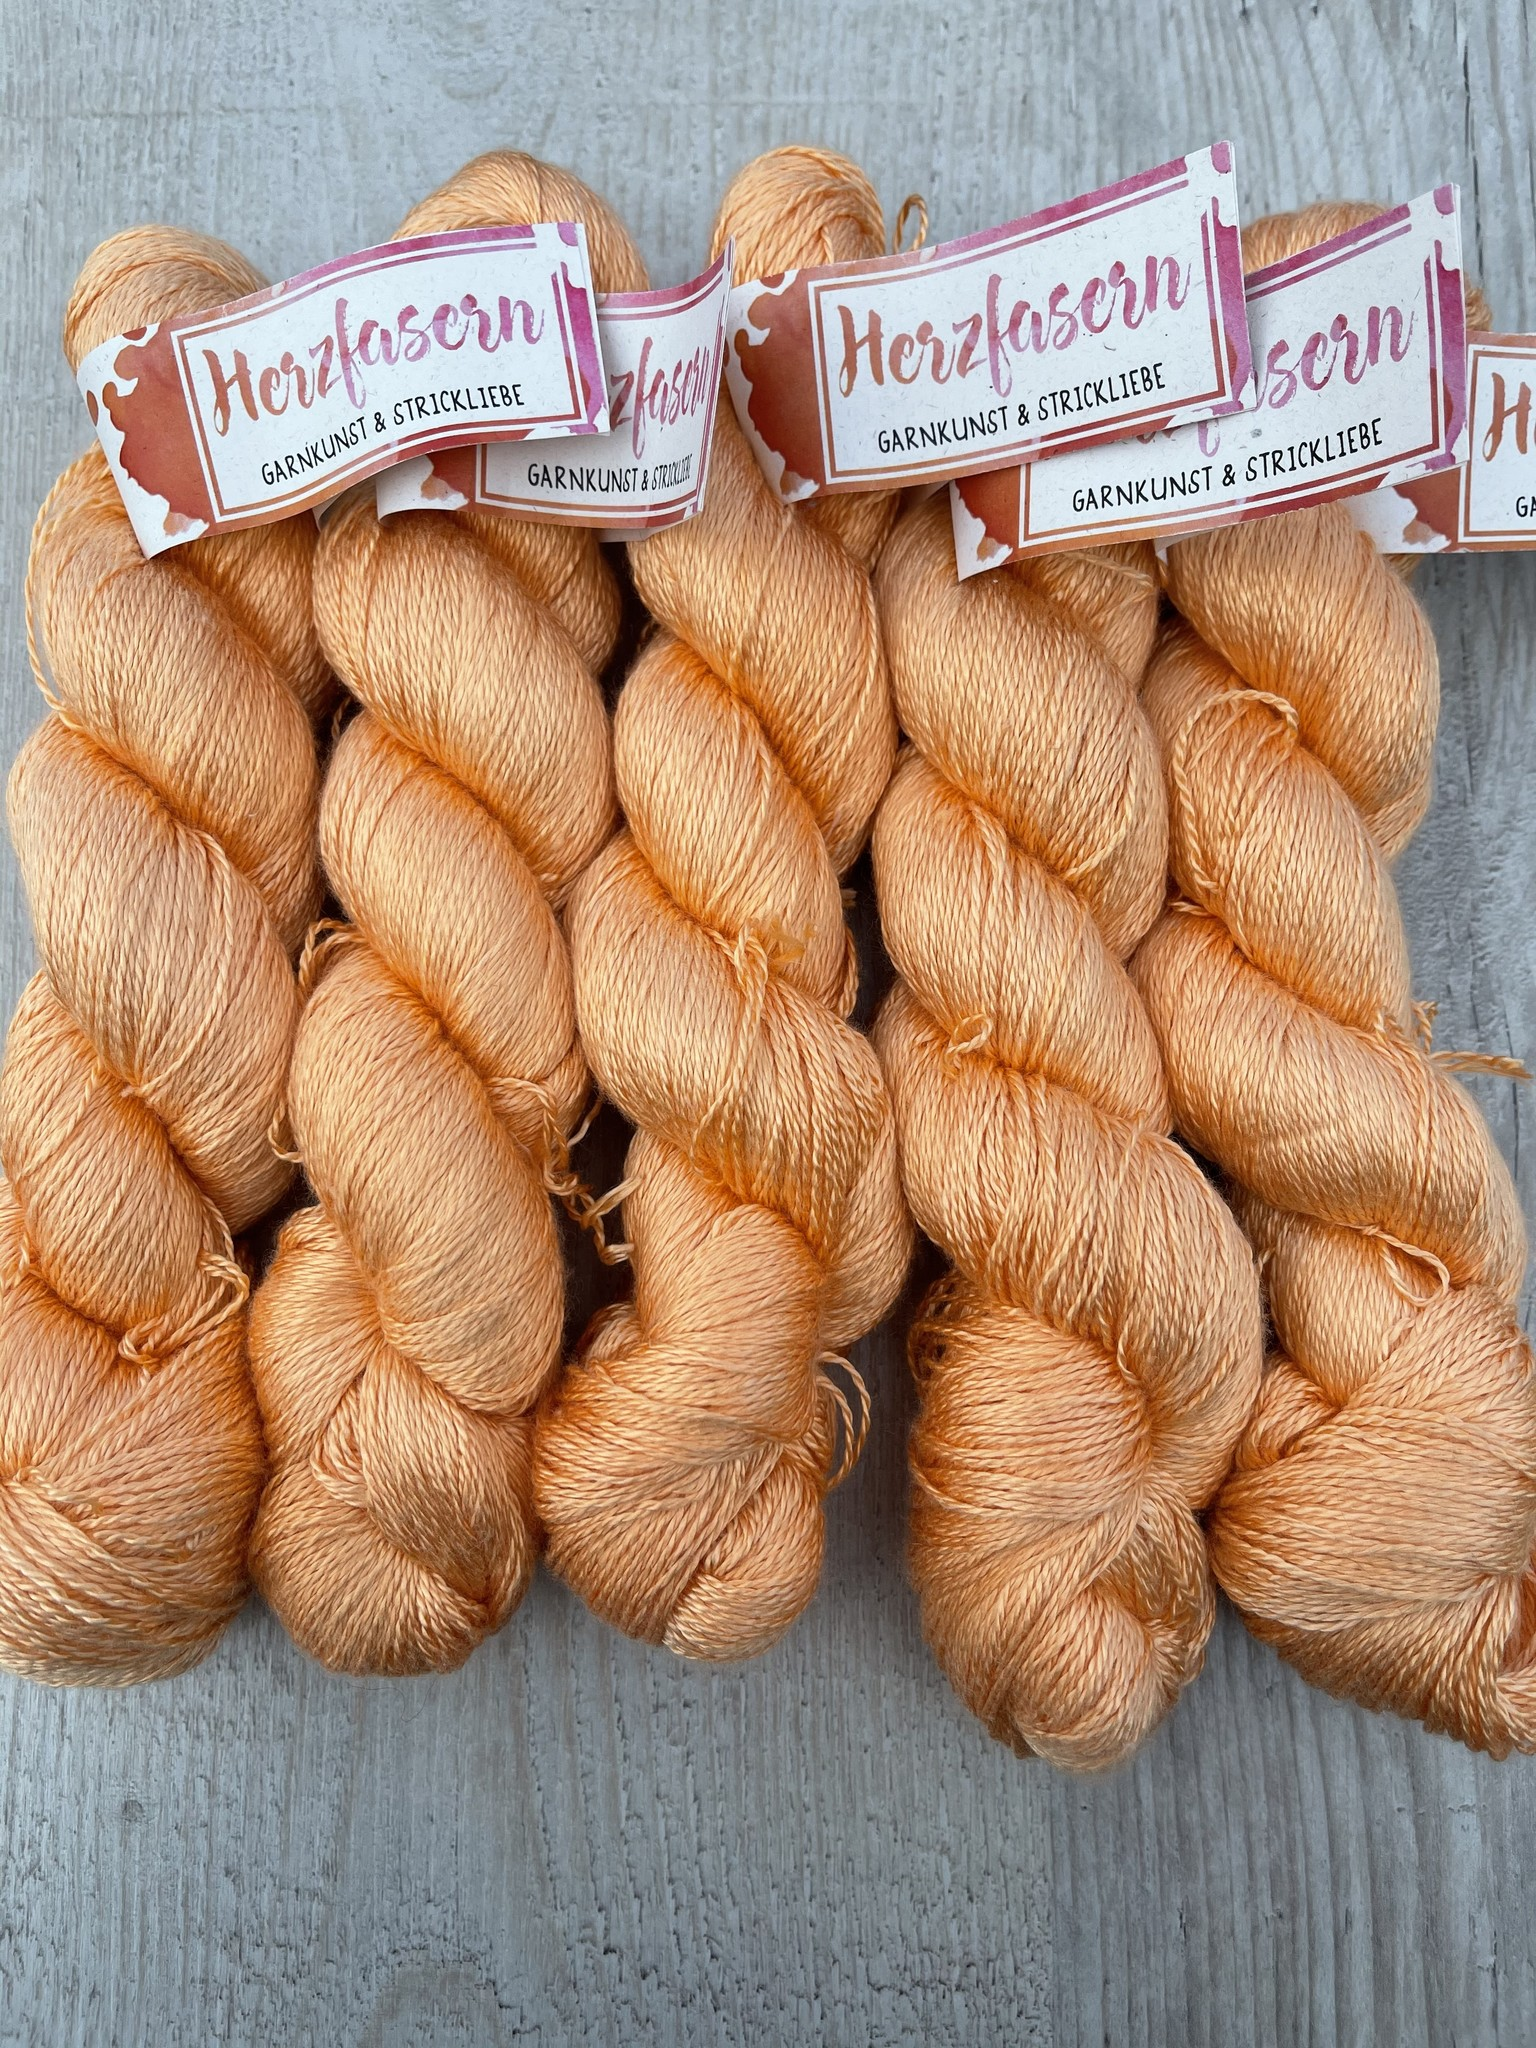 Herzfasern Seide Lace - Peach